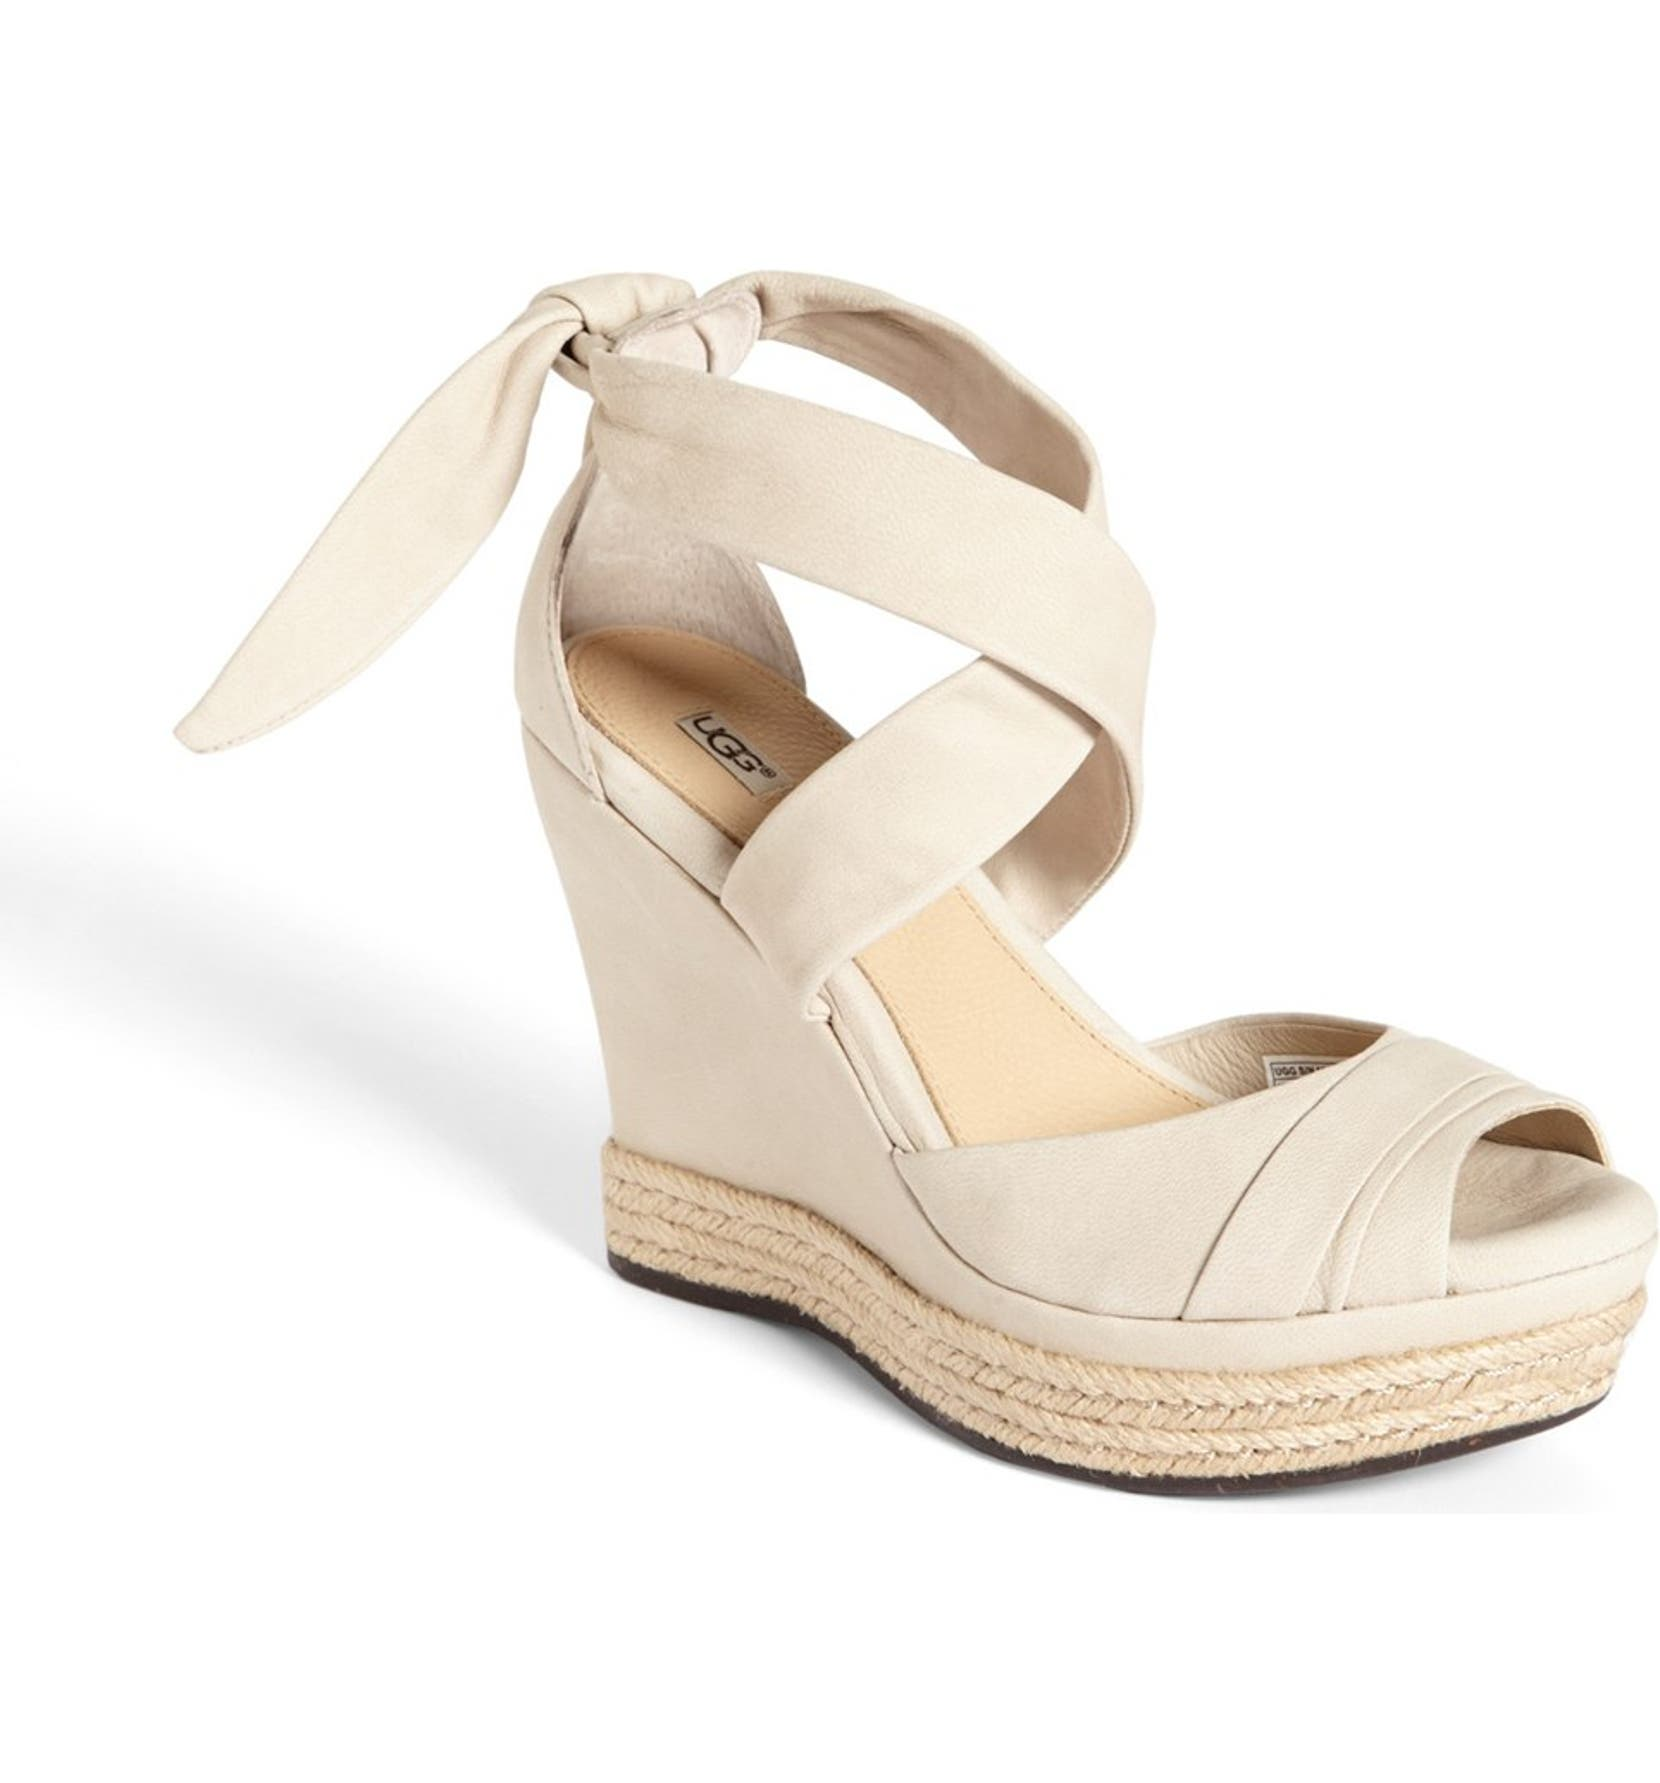 4530fd7fc3d Australia 'Lucy' Wedge Sandal